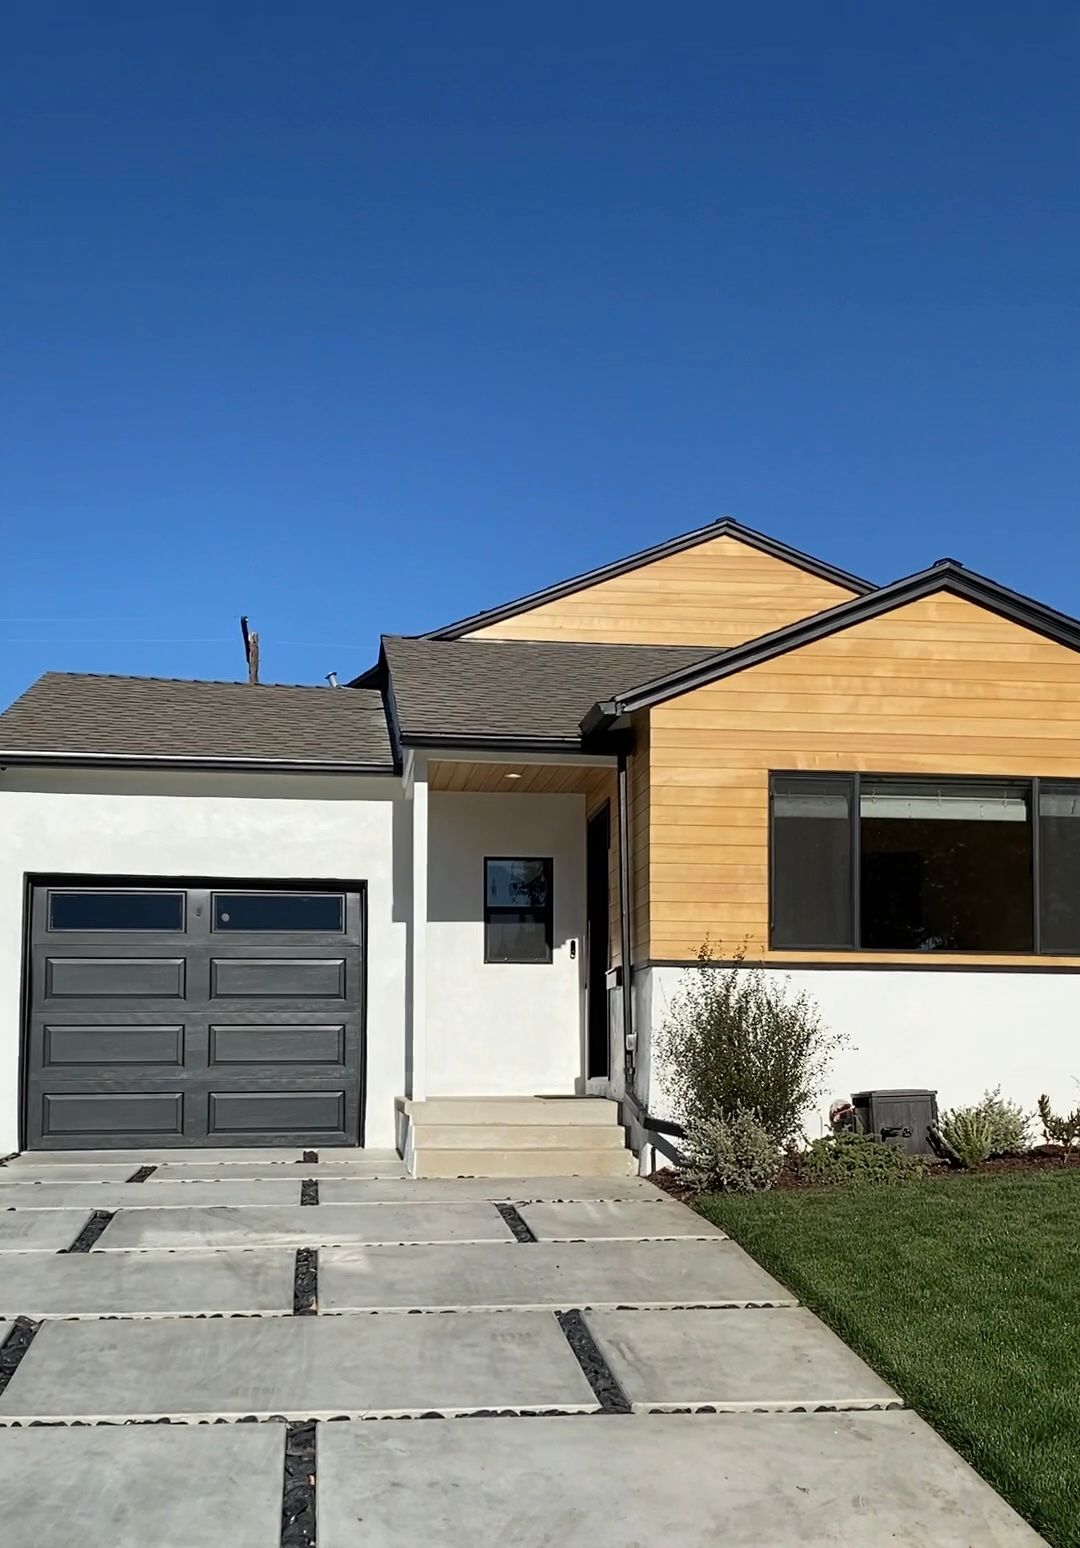 driveway remodel california skyline remodeling